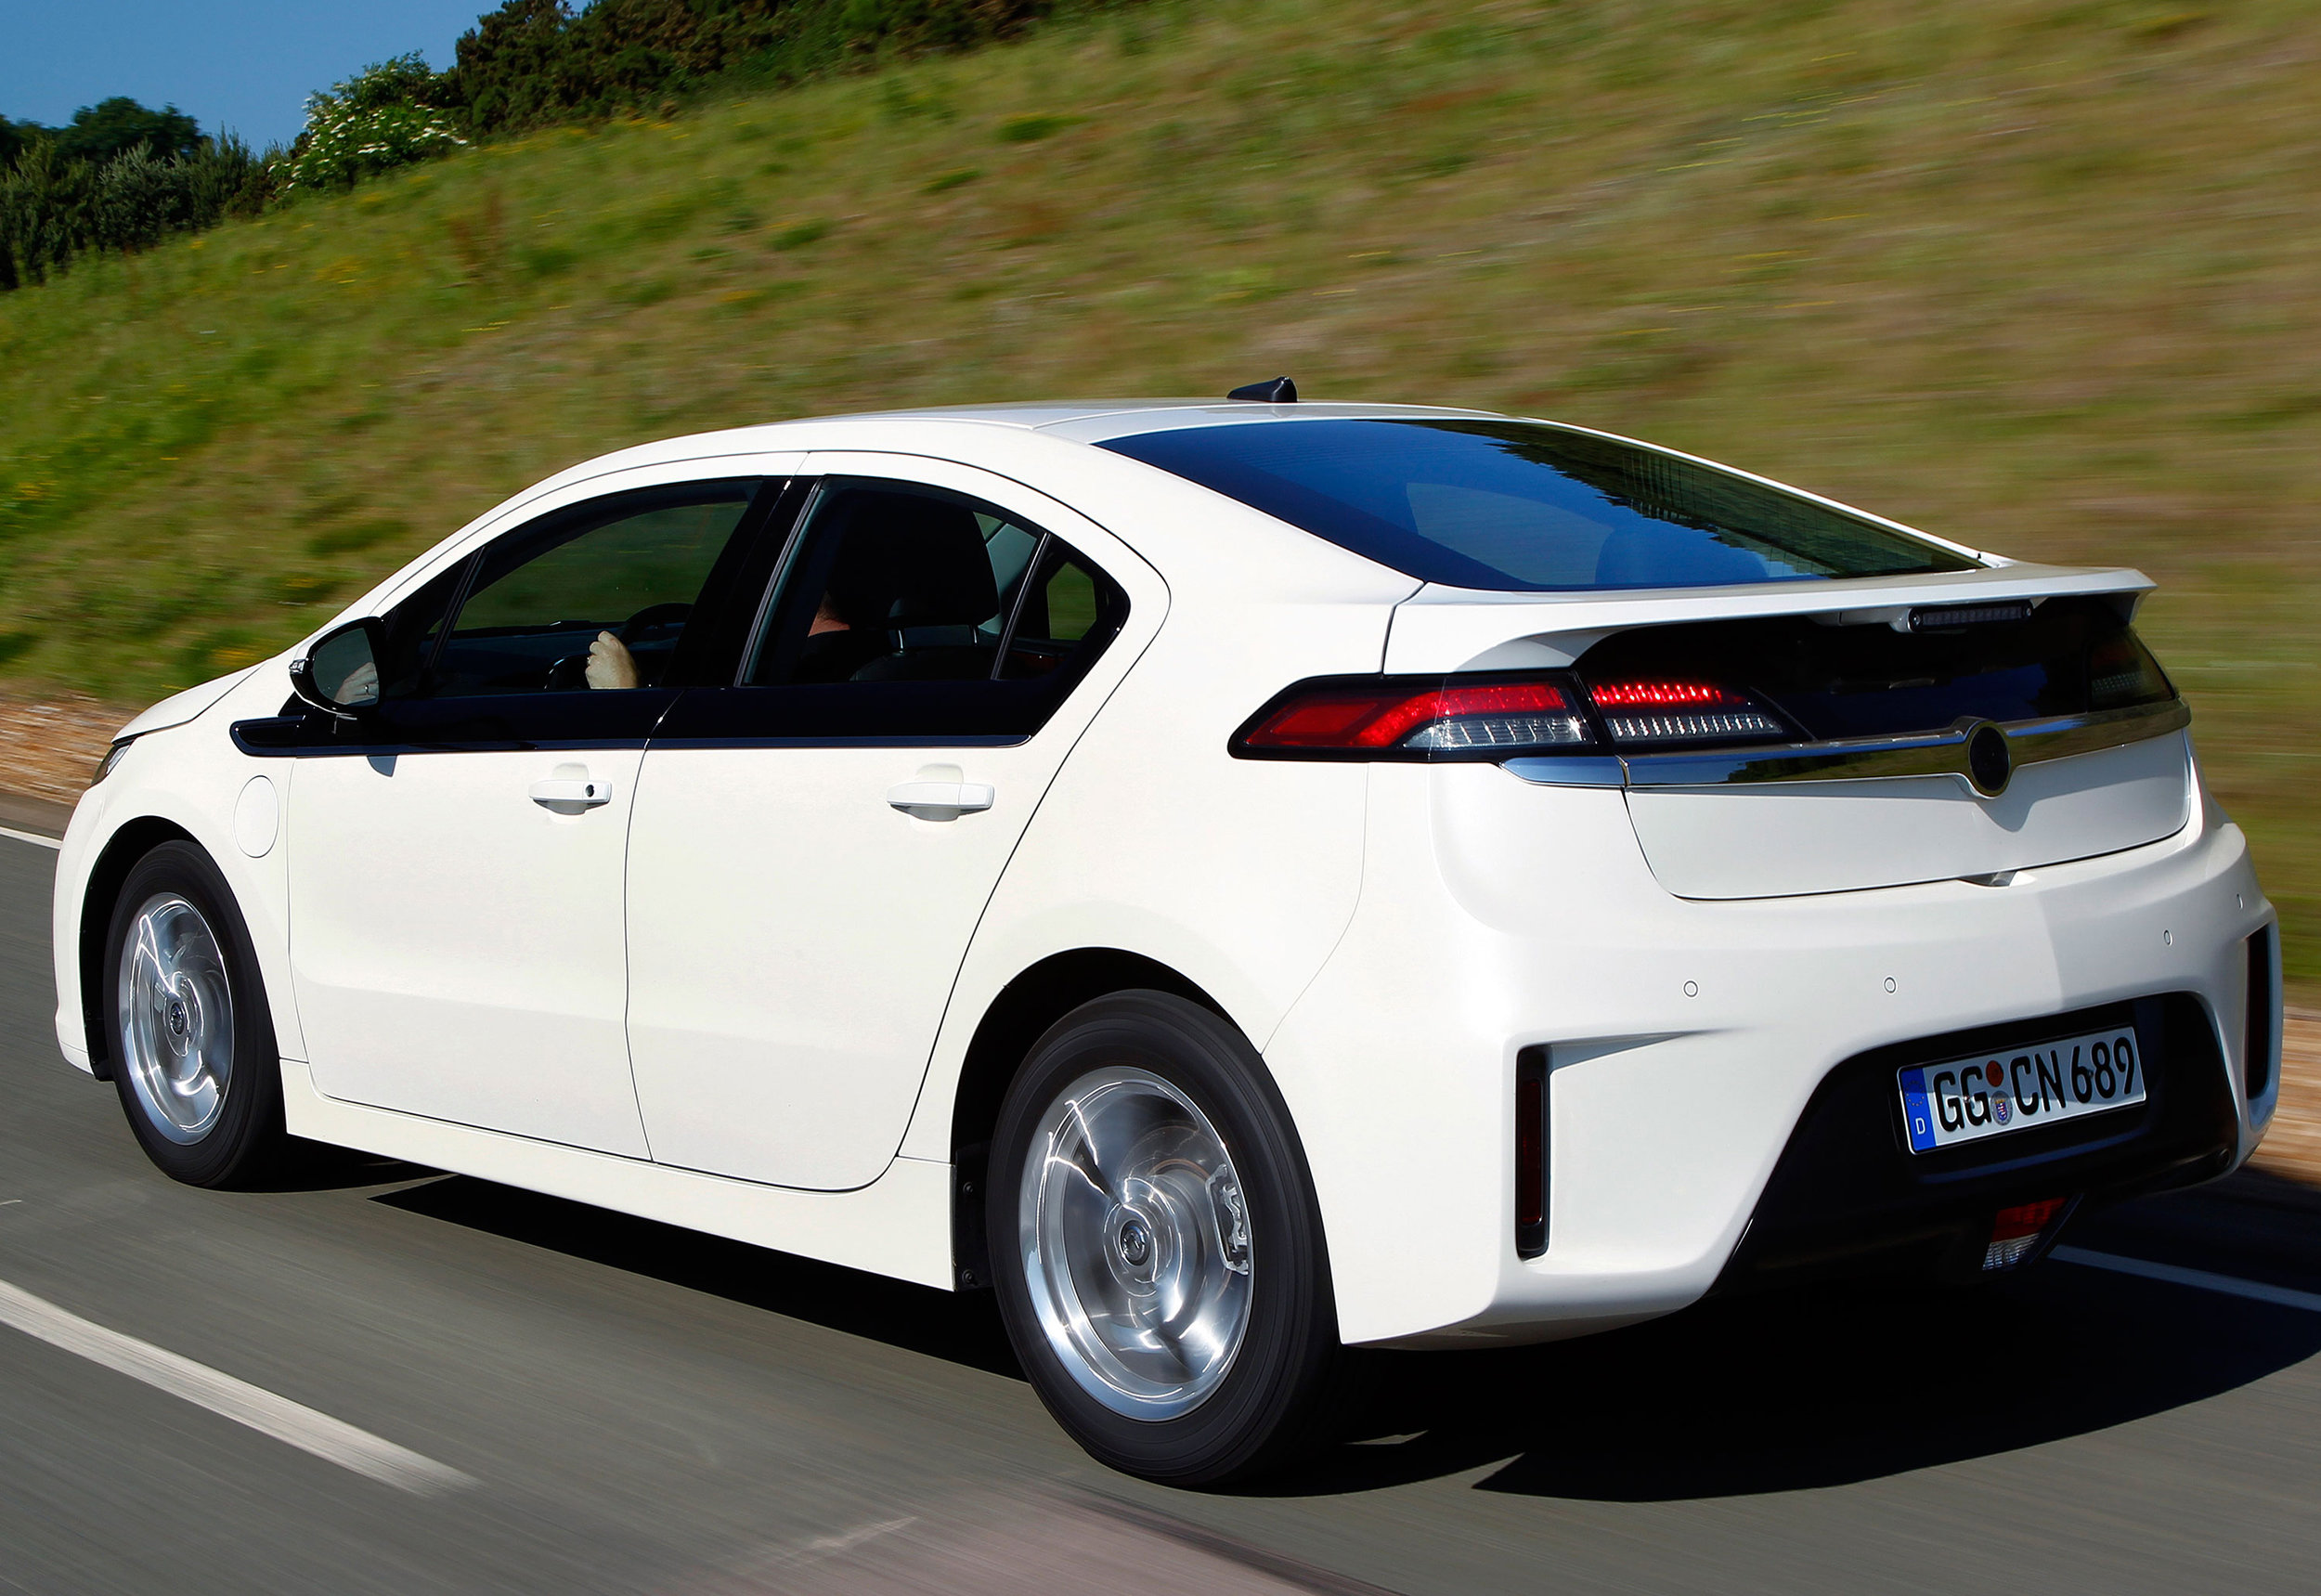 Vauxhall-Ampera-06.jpg